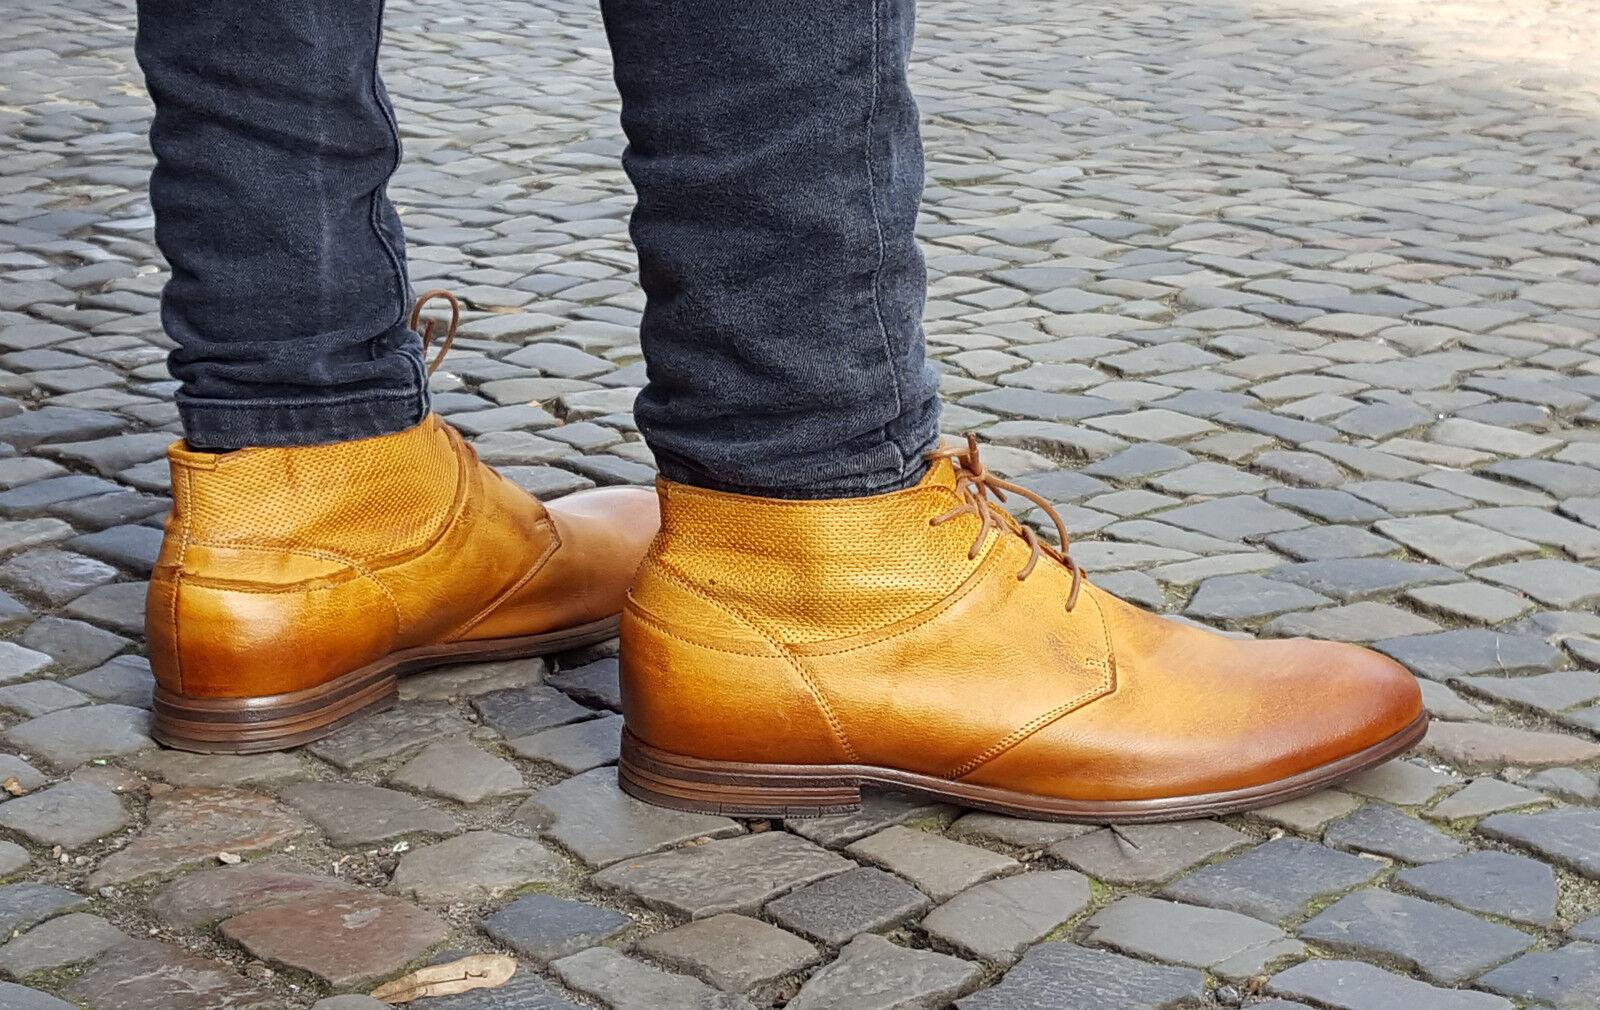 COXX BORBA Schuhe PILAU600 braun Herrenschuhe Echtleder Schnürschuhe Portugal